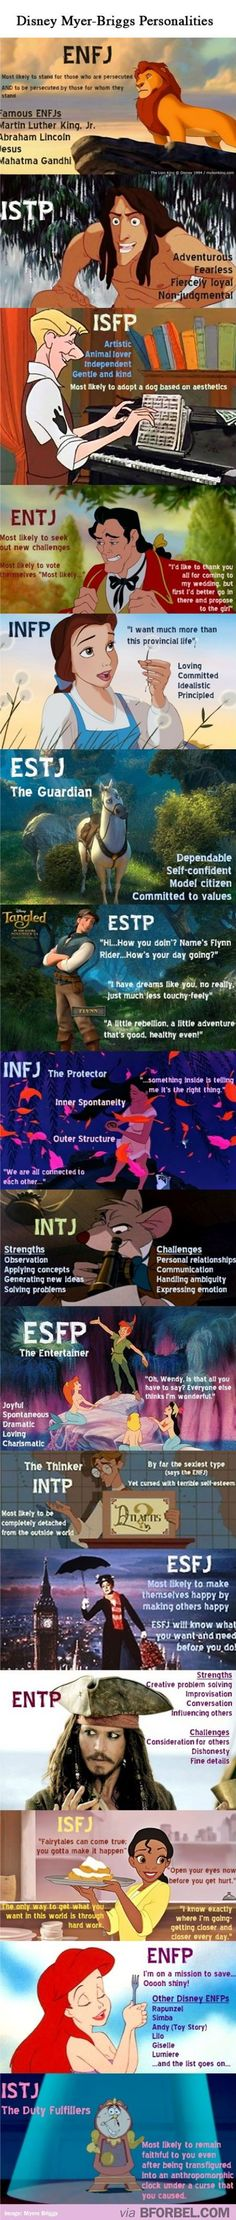 Myer-Briggs Disney Personalities